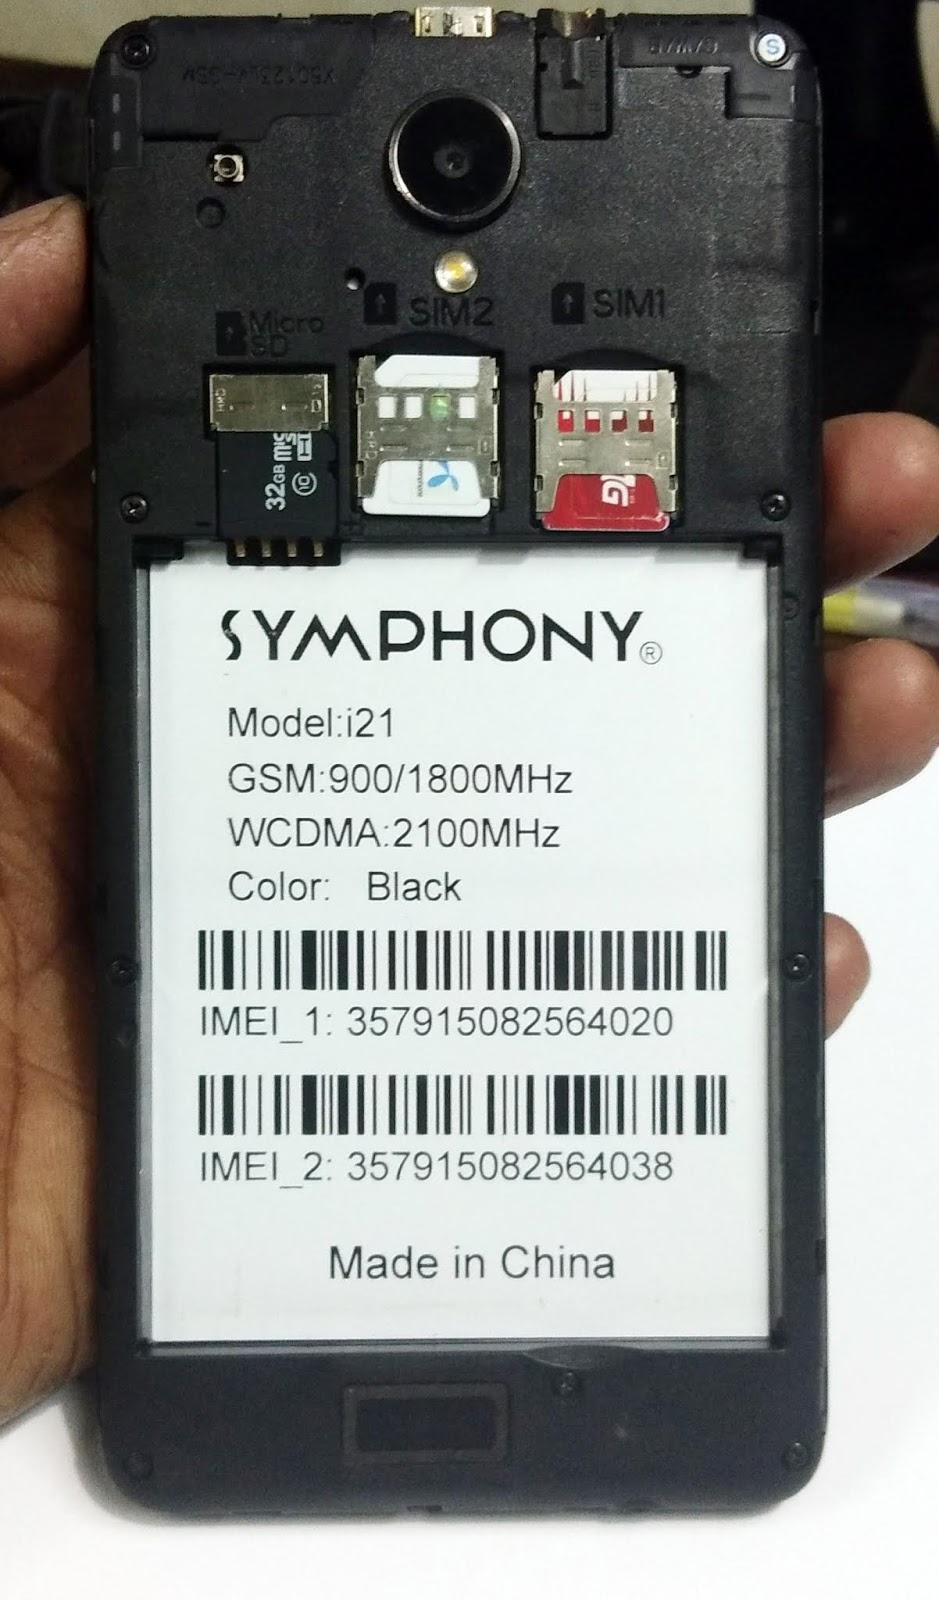 symphony i21 flash file